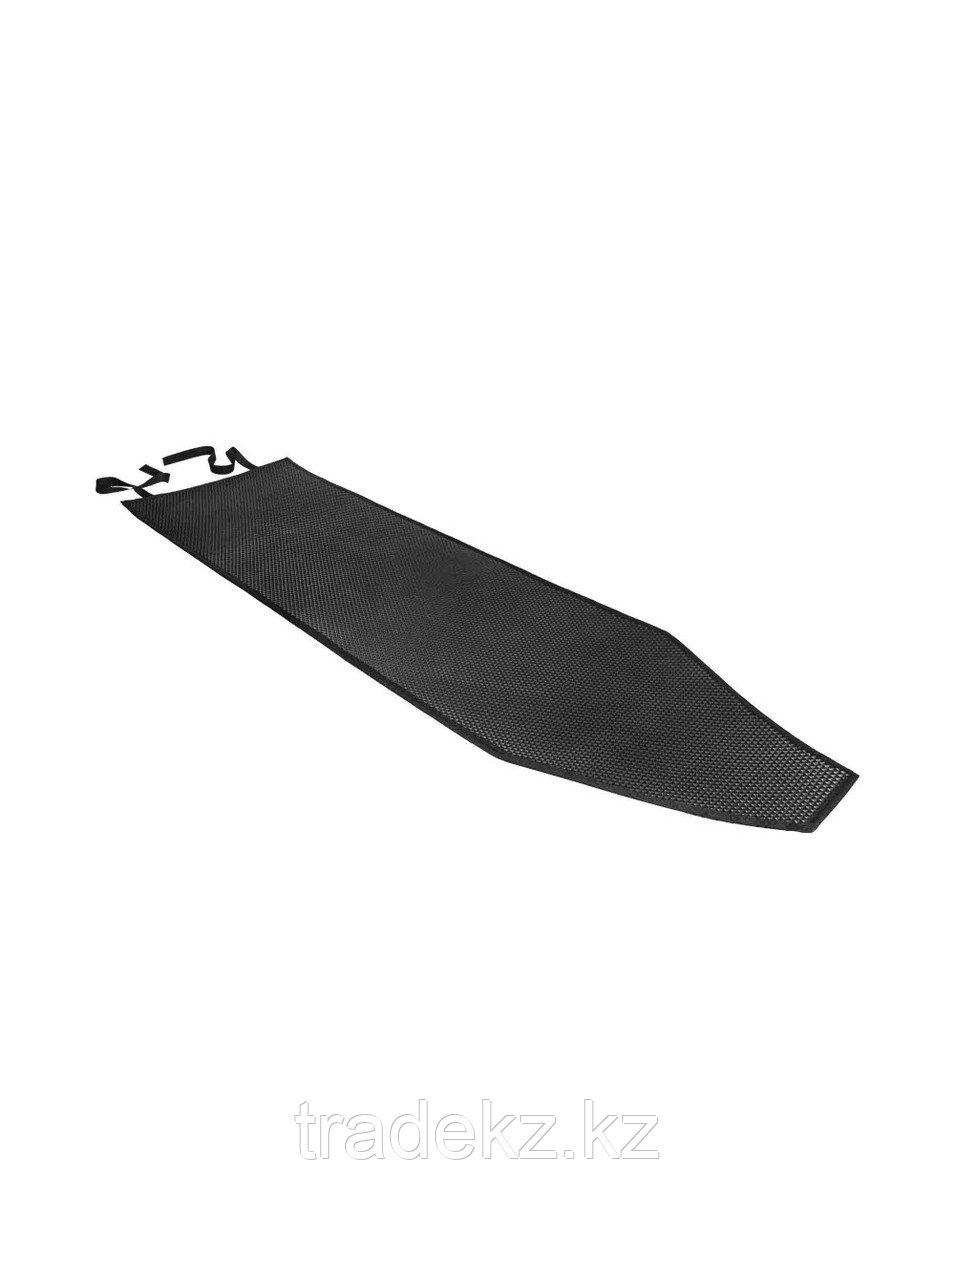 Коврик ЭВА EVA Proff по форме дна для лодки АПАЧИ 3300 НДНД (APACHE 3300 НДНД)